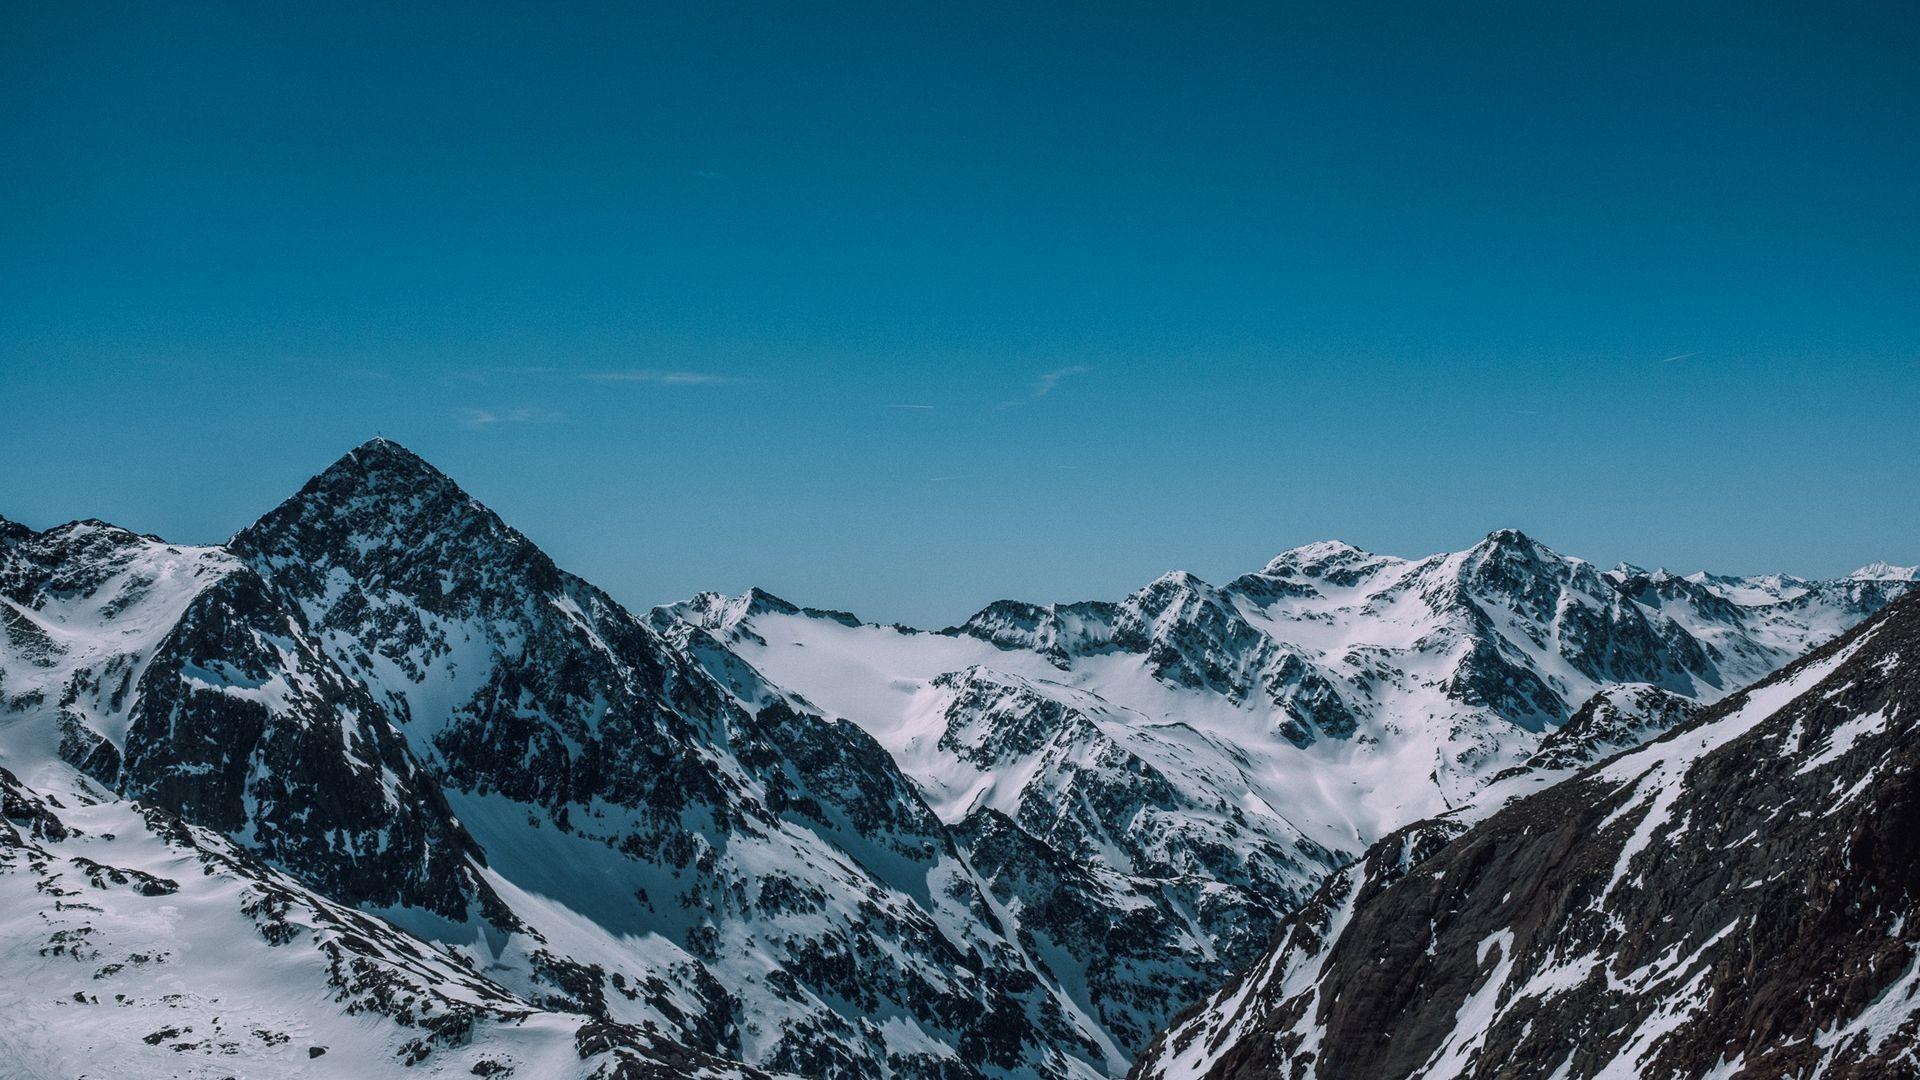 Res: 1920x1080, Stubai Glacier Snowy Mountains Wallpaper HD